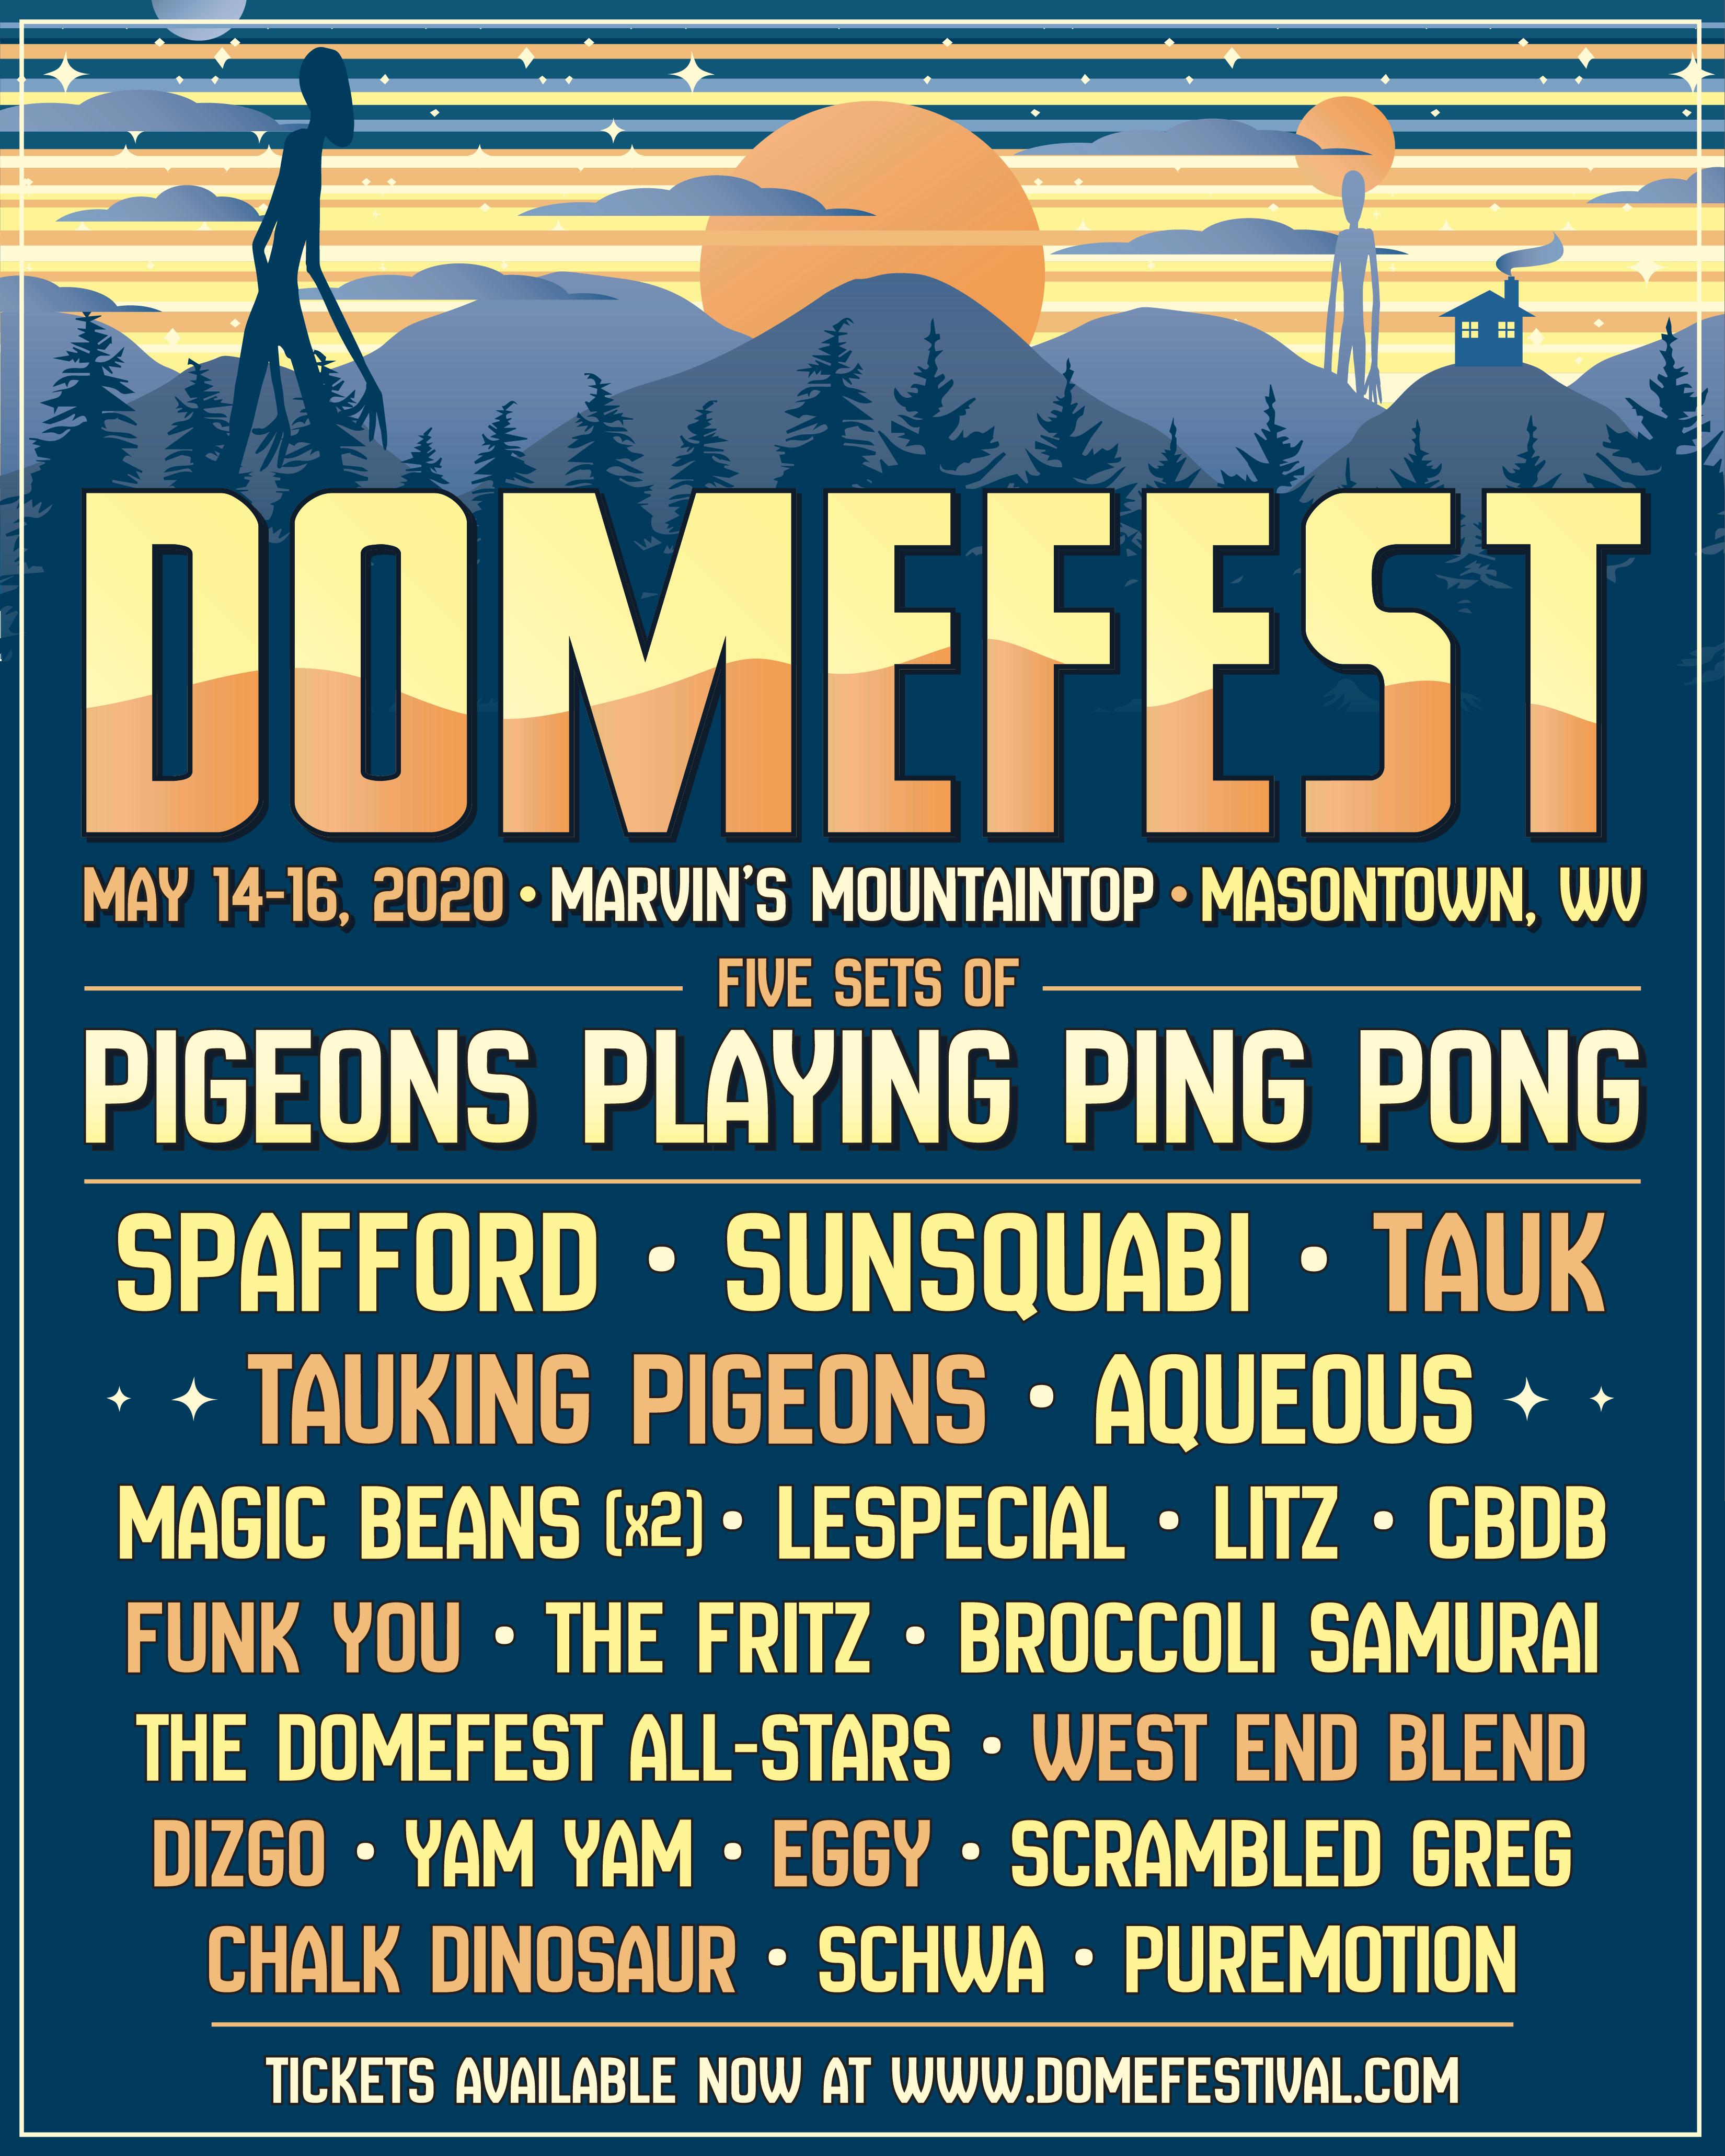 Domefest 2020 Final Lineup